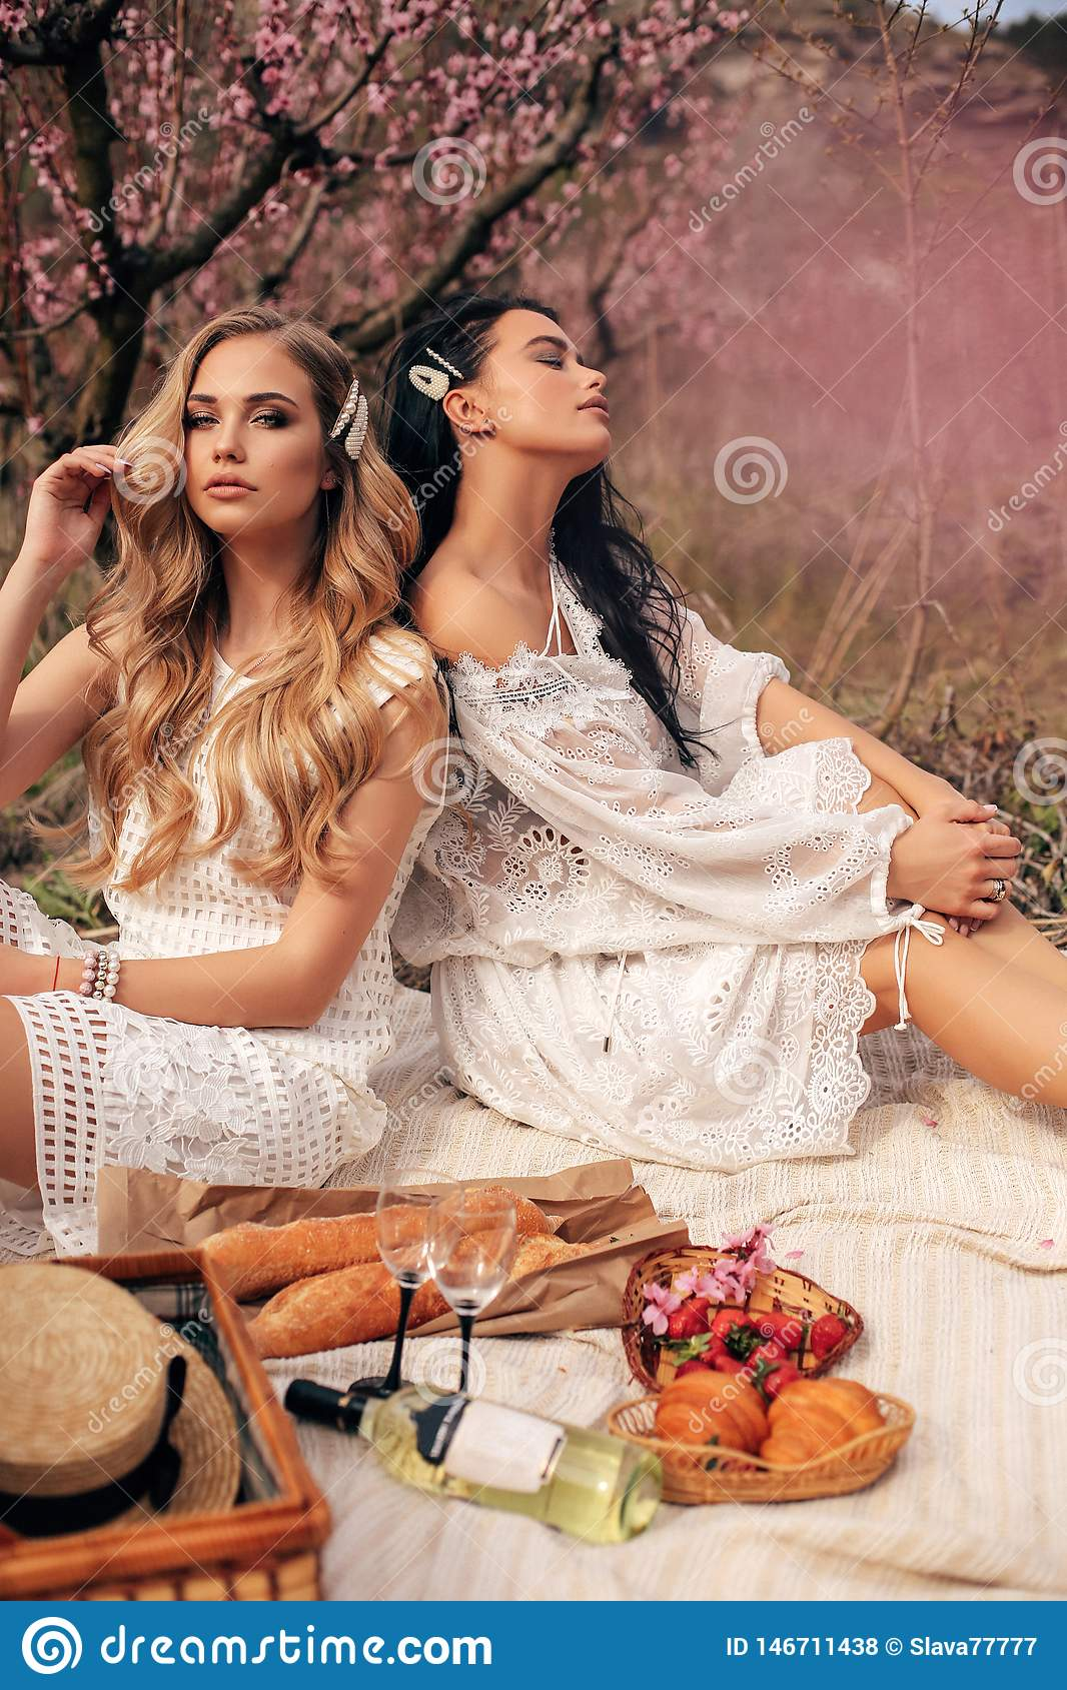 Beautiful girls in elegant dresses having romantic picnic among flowering peach trees in garden